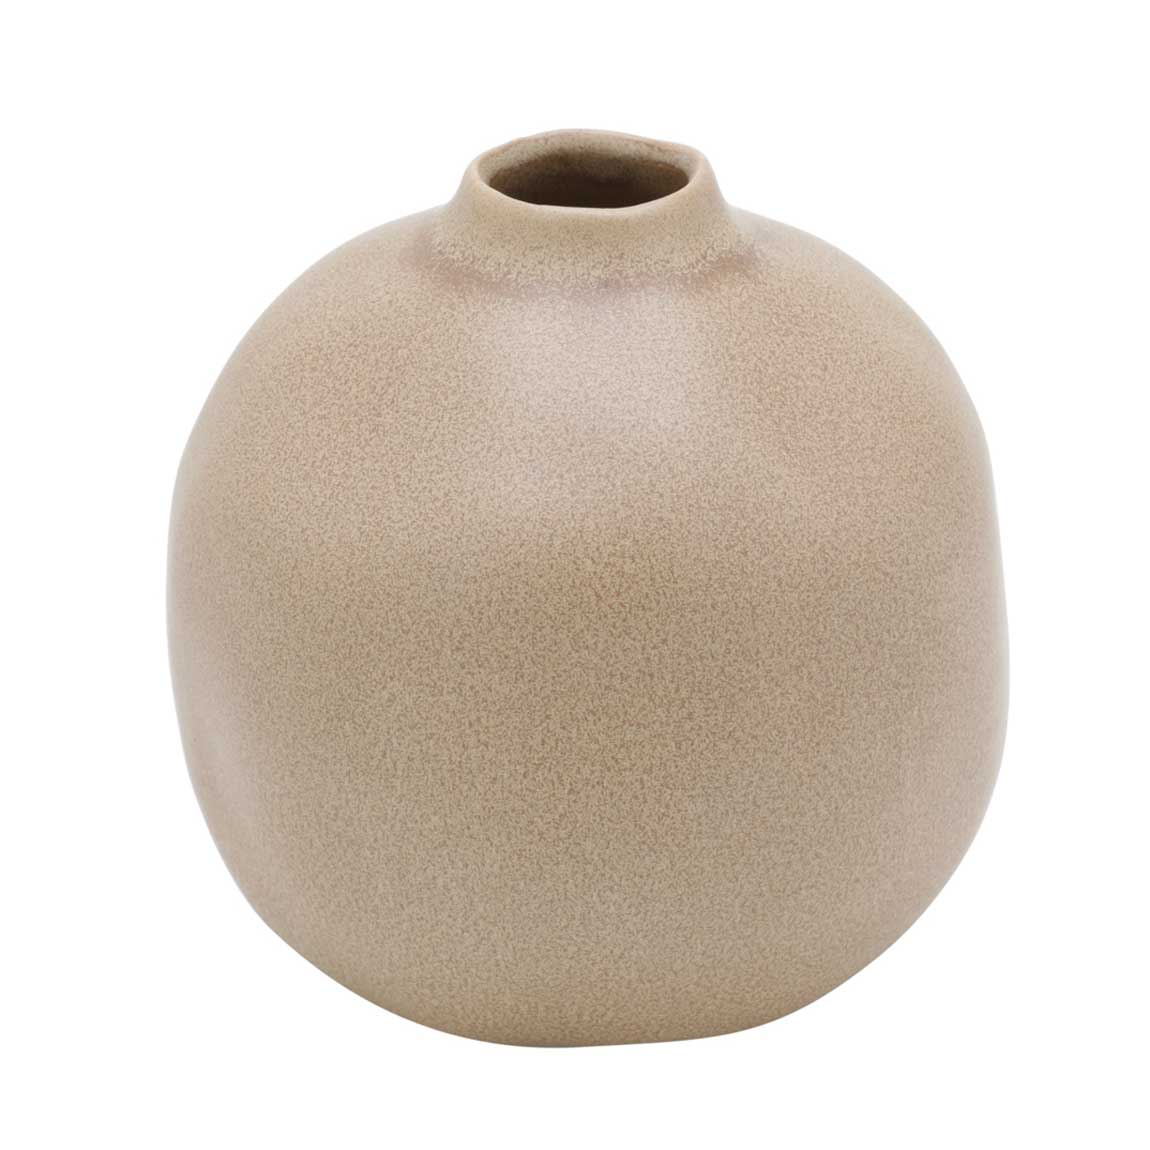 Vaso Decorativo de Cerâmica Bola Marrom